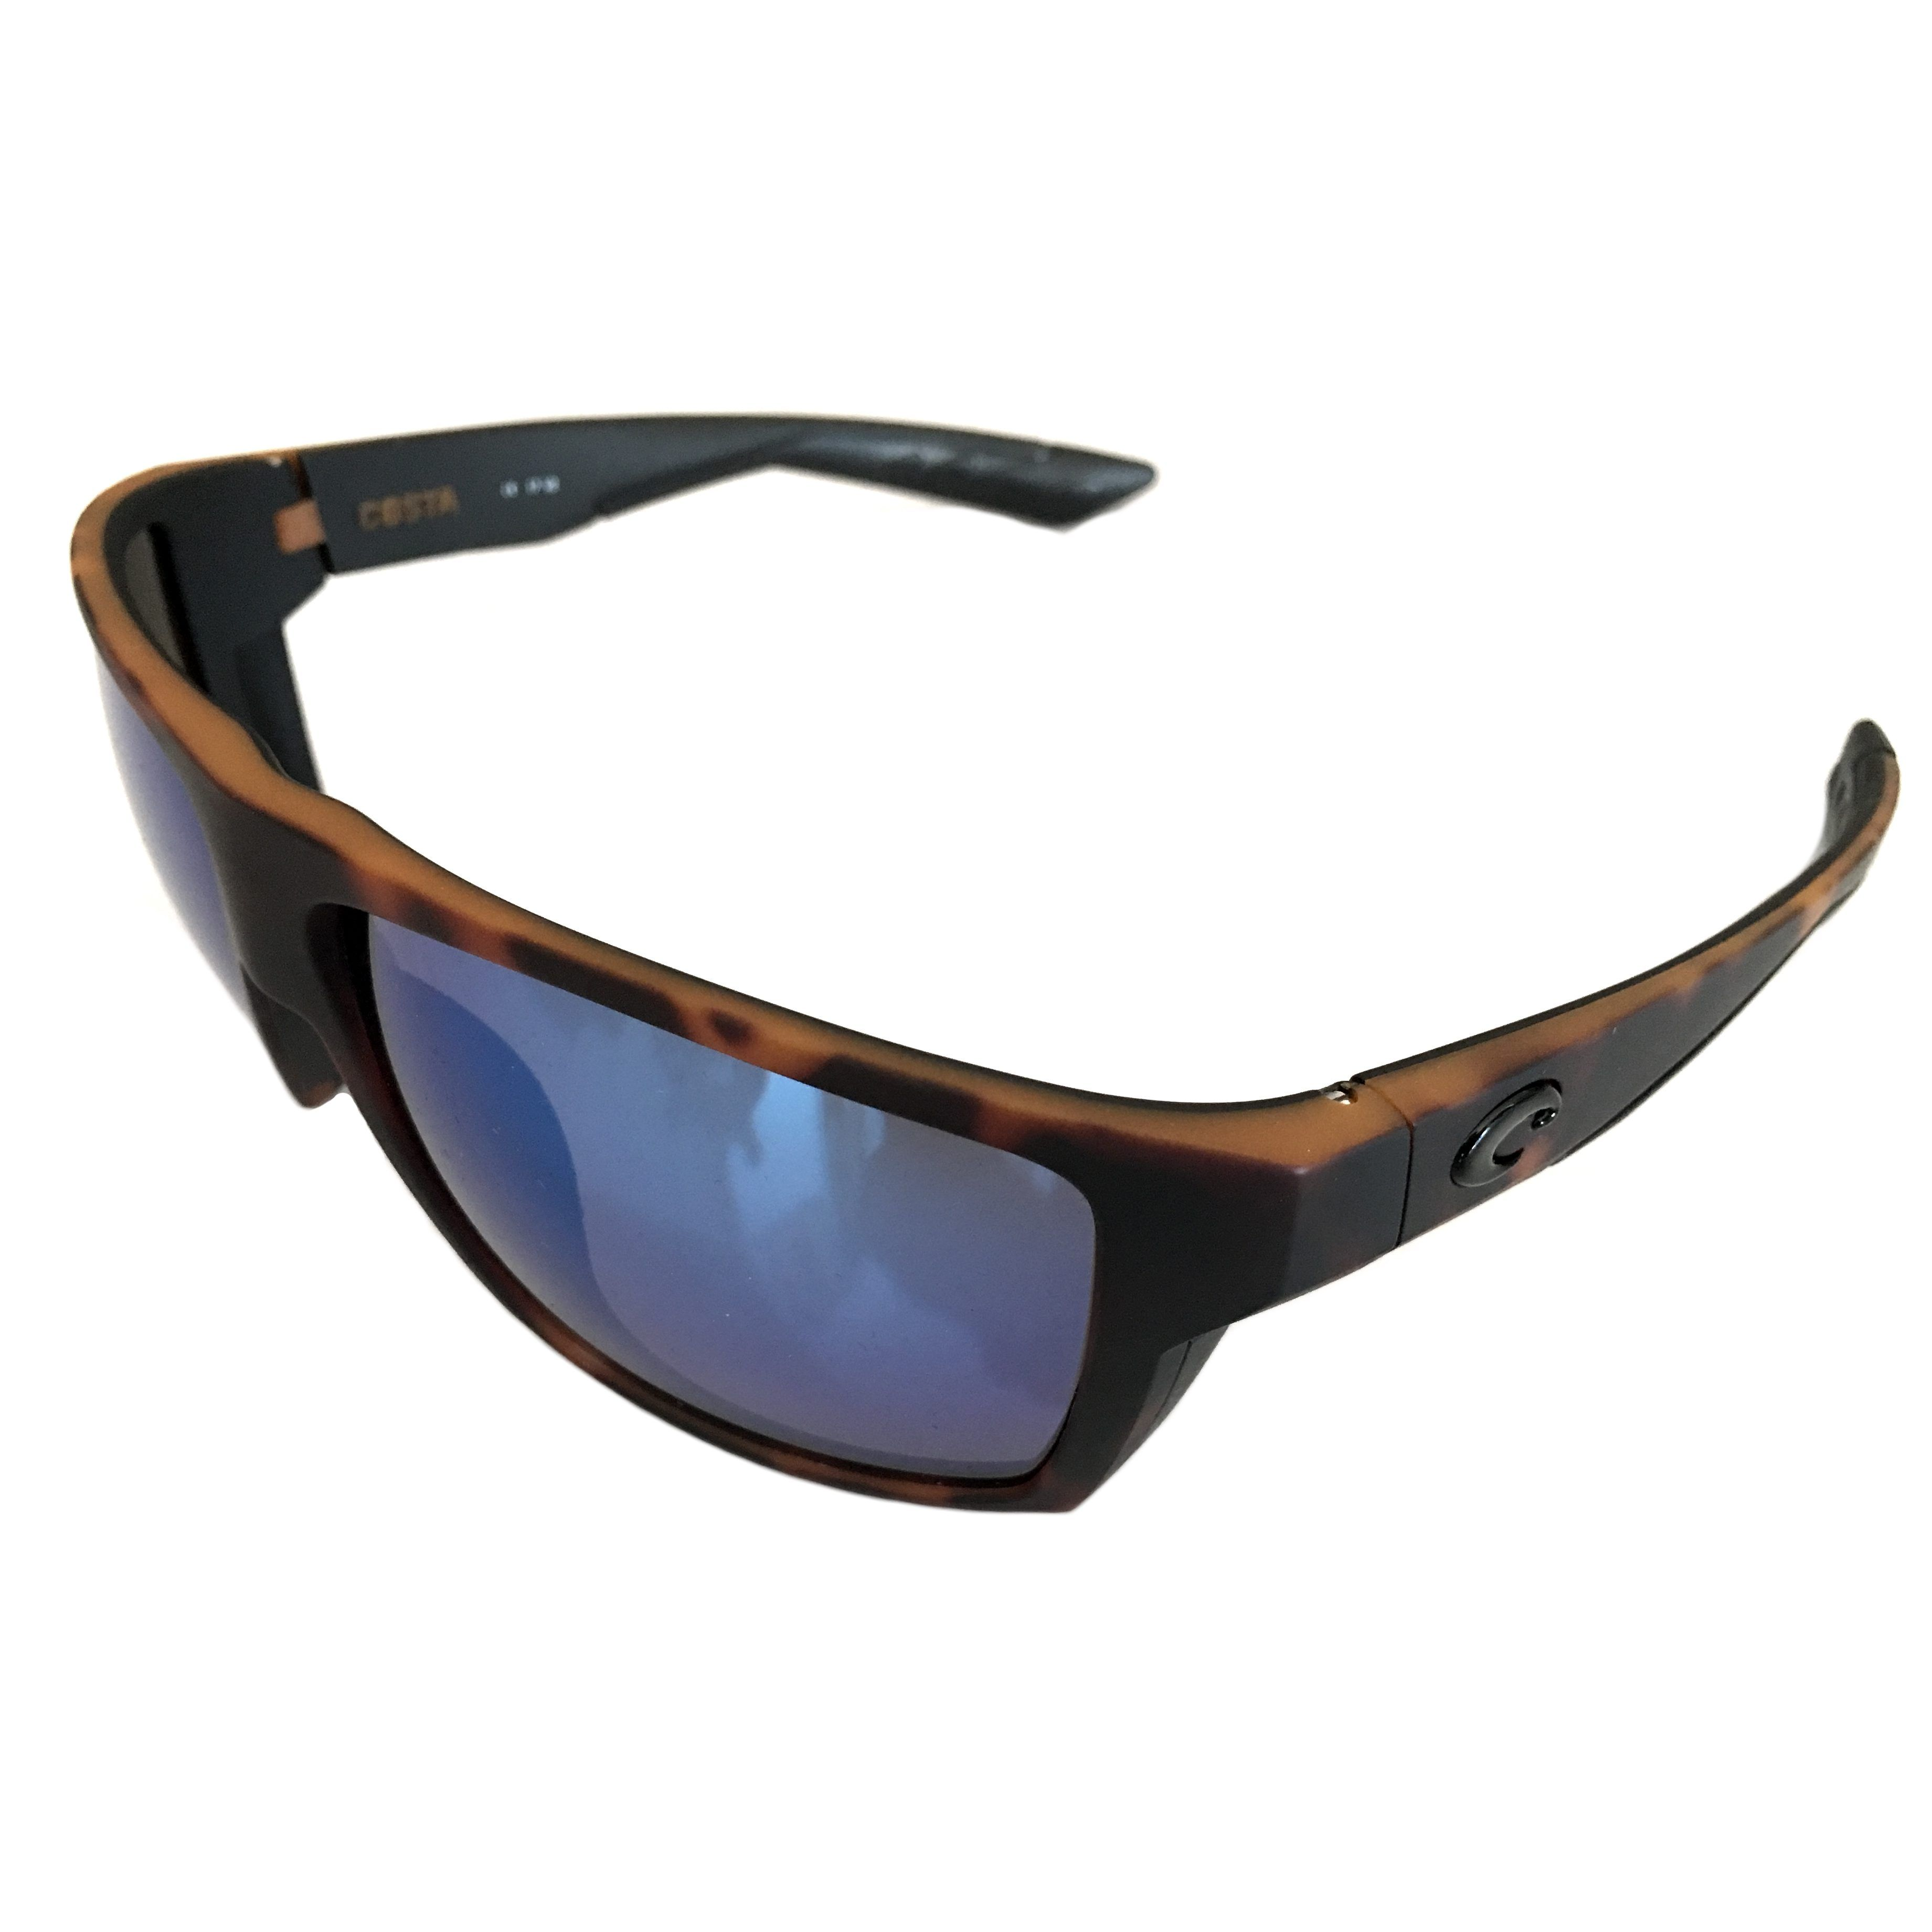 84b5776217a7 Costa Del Mar Bloke Sunglasses – Matte Tortoise Frame – Polarized Blue  Mirror 400G | NativeSlope.com